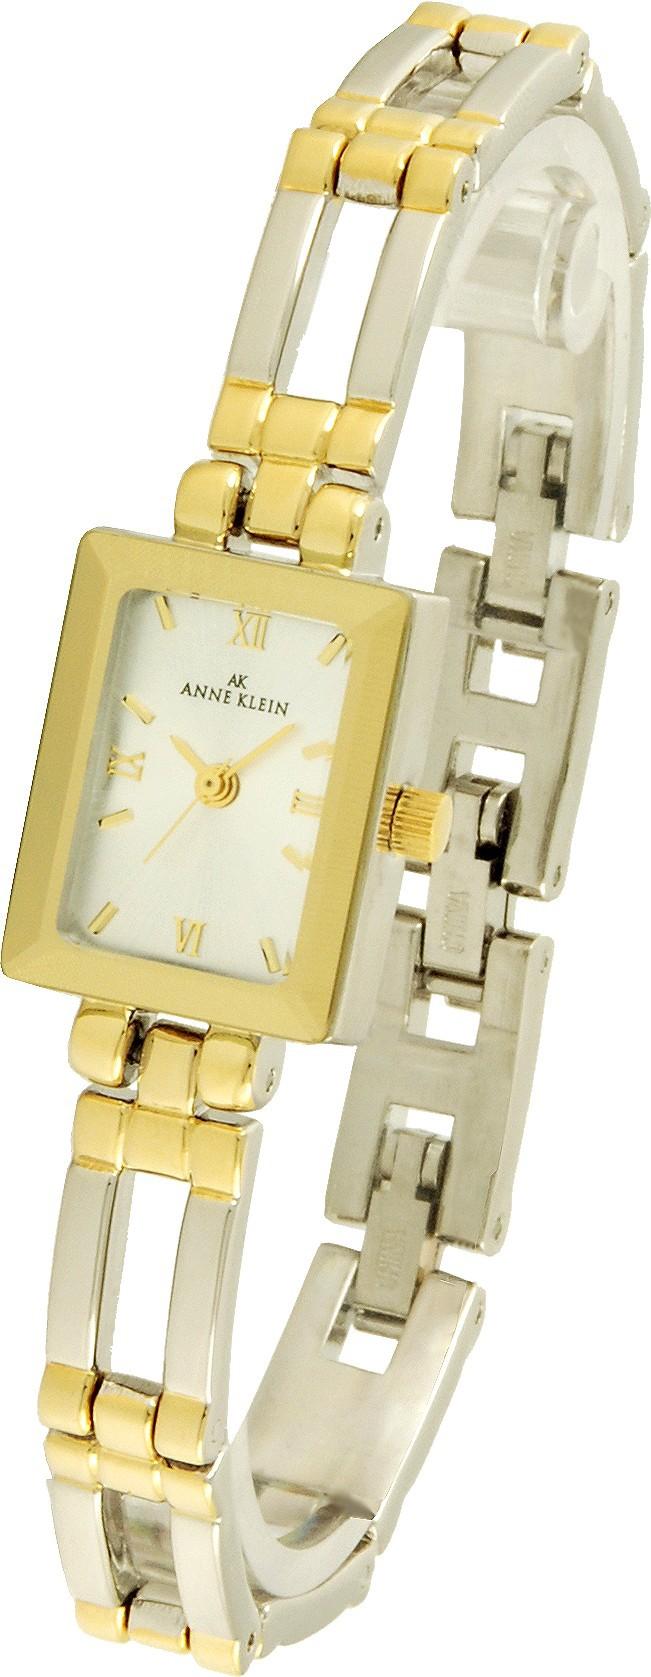 Anne Klein 4899SVTT - женские наручные часы из коллекции DailyAnne Klein<br><br><br>Бренд: Anne Klein<br>Модель: Anne Klein 4899 SVTT<br>Артикул: 4899SVTT<br>Вариант артикула: None<br>Коллекция: Daily<br>Подколлекция: None<br>Страна: США<br>Пол: женские<br>Тип механизма: кварцевые<br>Механизм: Ronda 753<br>Количество камней: None<br>Автоподзавод: None<br>Источник энергии: None<br>Срок службы элемента питания: None<br>Дисплей: стрелки<br>Цифры: римские<br>Водозащита: None<br>Противоударные: None<br>Материал корпуса: нерж. сталь<br>Материал браслета: не указан<br>Материал безеля: None<br>Стекло: минеральное<br>Антибликовое покрытие: None<br>Цвет корпуса: None<br>Цвет браслета: None<br>Цвет циферблата: None<br>Цвет безеля: None<br>Размеры: None<br>Диаметр: None<br>Диаметр корпуса: None<br>Толщина: None<br>Ширина ремешка: None<br>Вес: None<br>Спорт-функции: None<br>Подсветка: None<br>Вставка: None<br>Отображение даты: None<br>Хронограф: None<br>Таймер: None<br>Термометр: None<br>Хронометр: None<br>GPS: None<br>Радиосинхронизация: None<br>Барометр: None<br>Скелетон: None<br>Дополнительная информация: None<br>Дополнительные функции: None